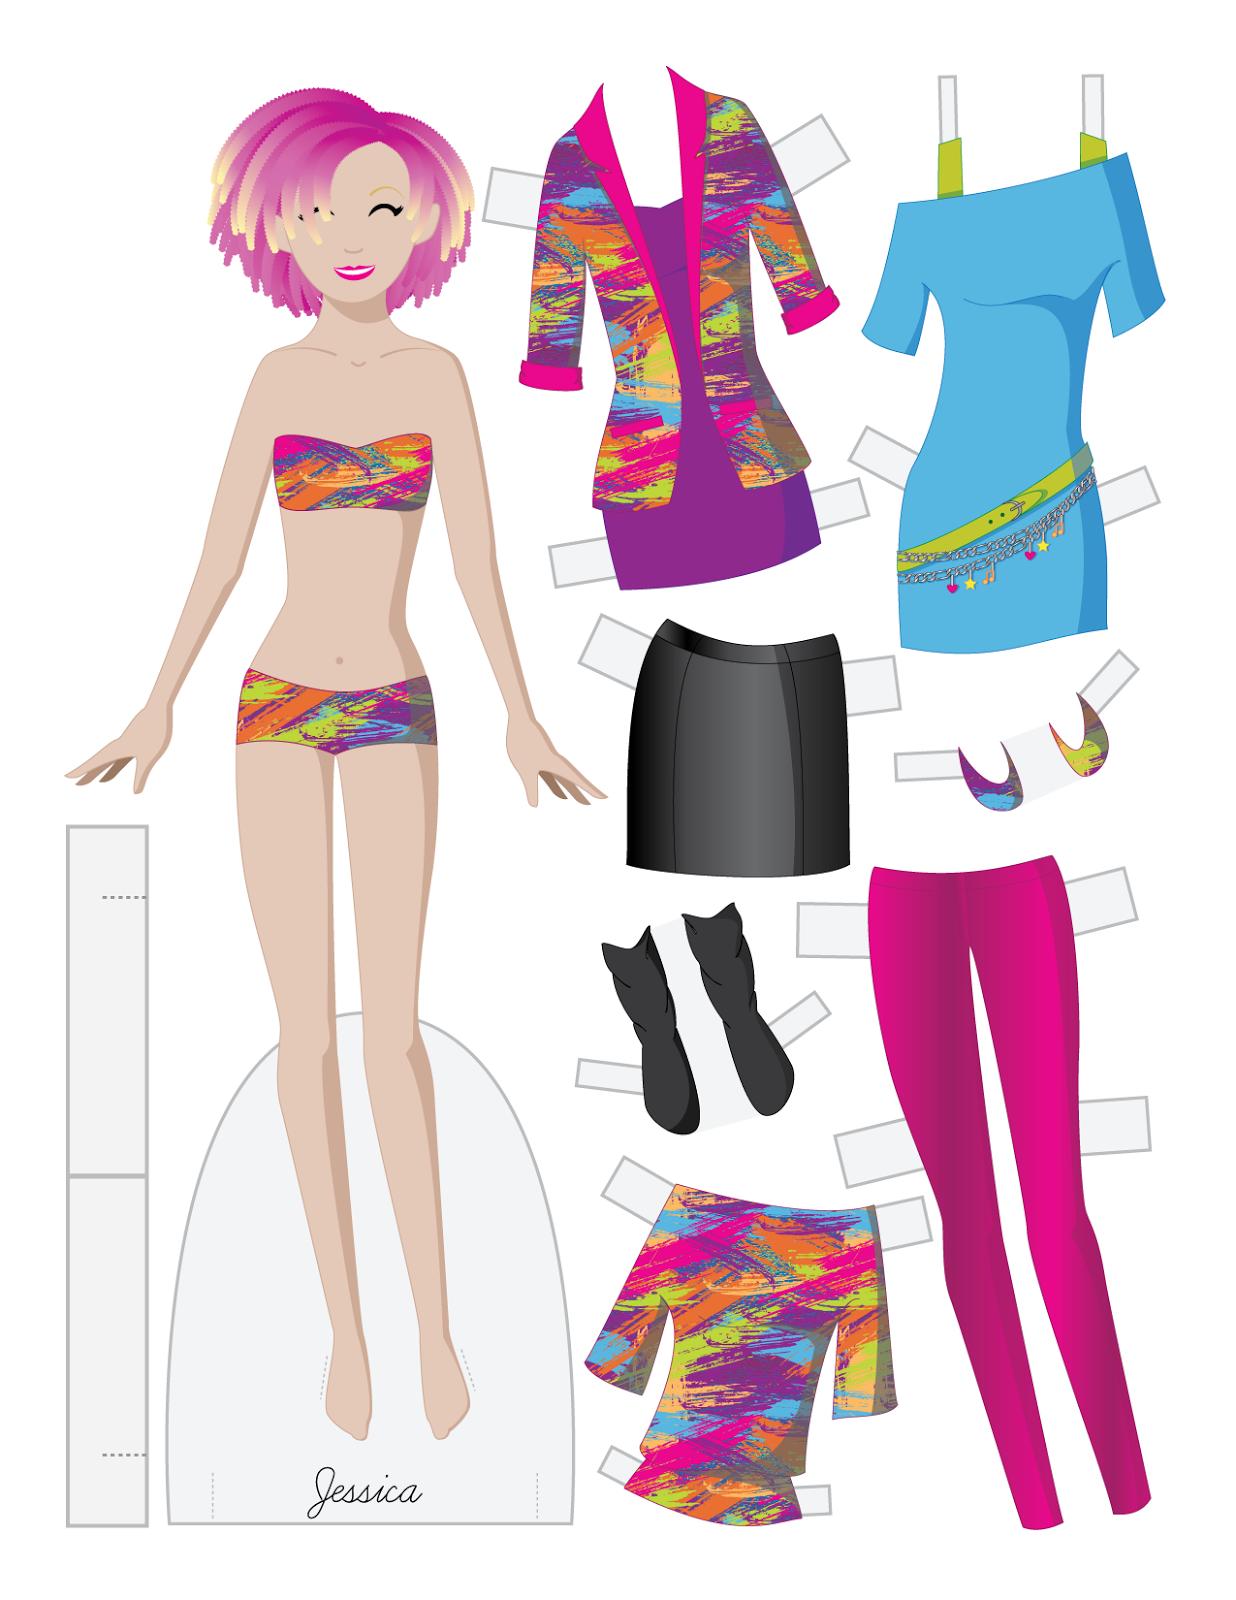 JESSICA by Julie Matthews from Paper Doll School | PAPER DOLLS ...